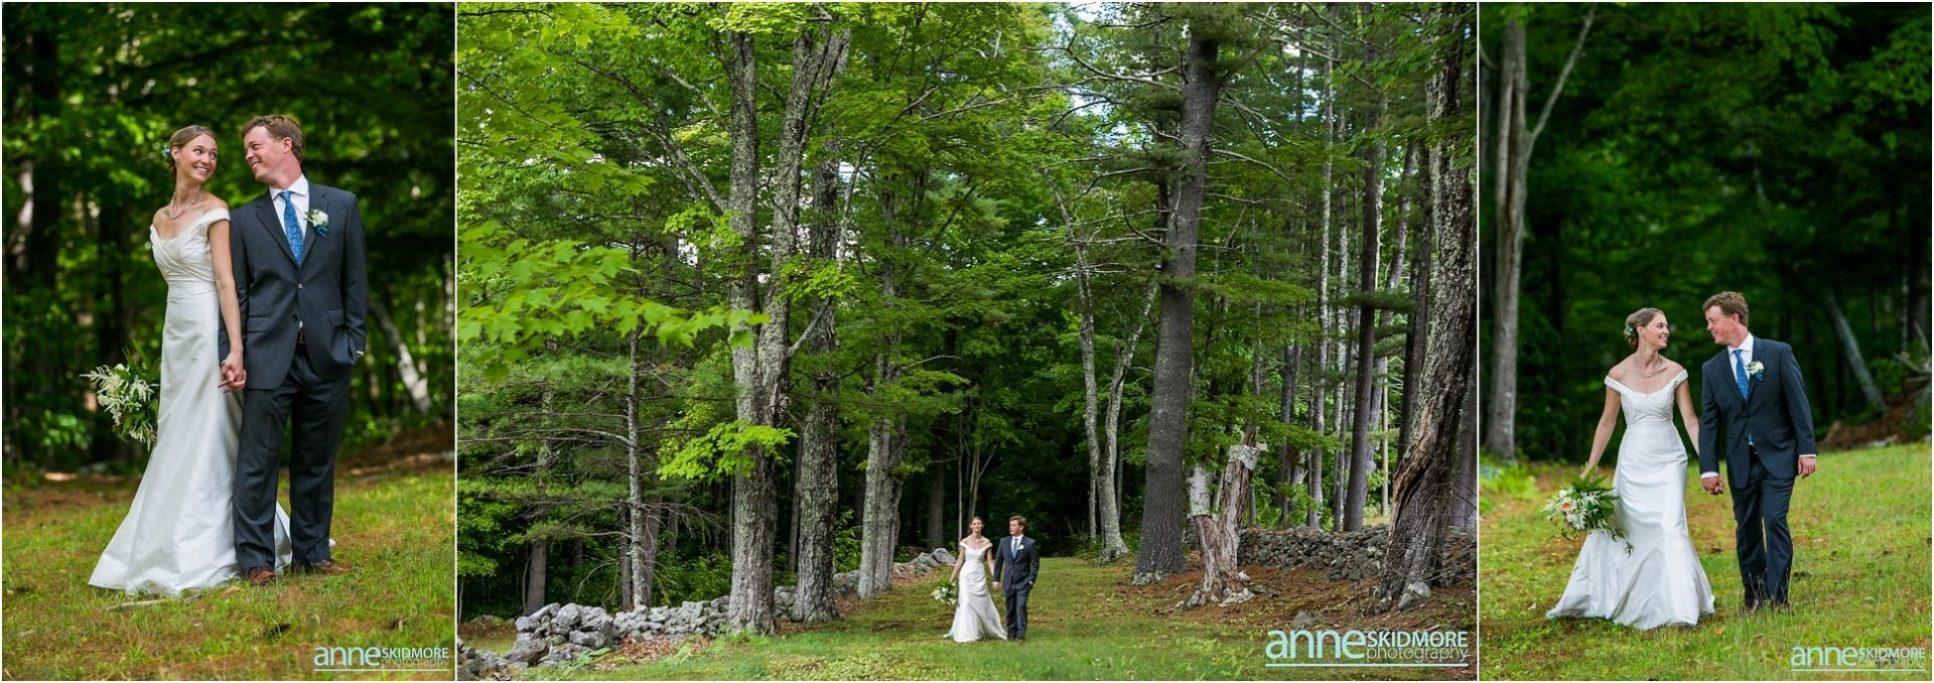 new_hampshire_wedding_photography_0029